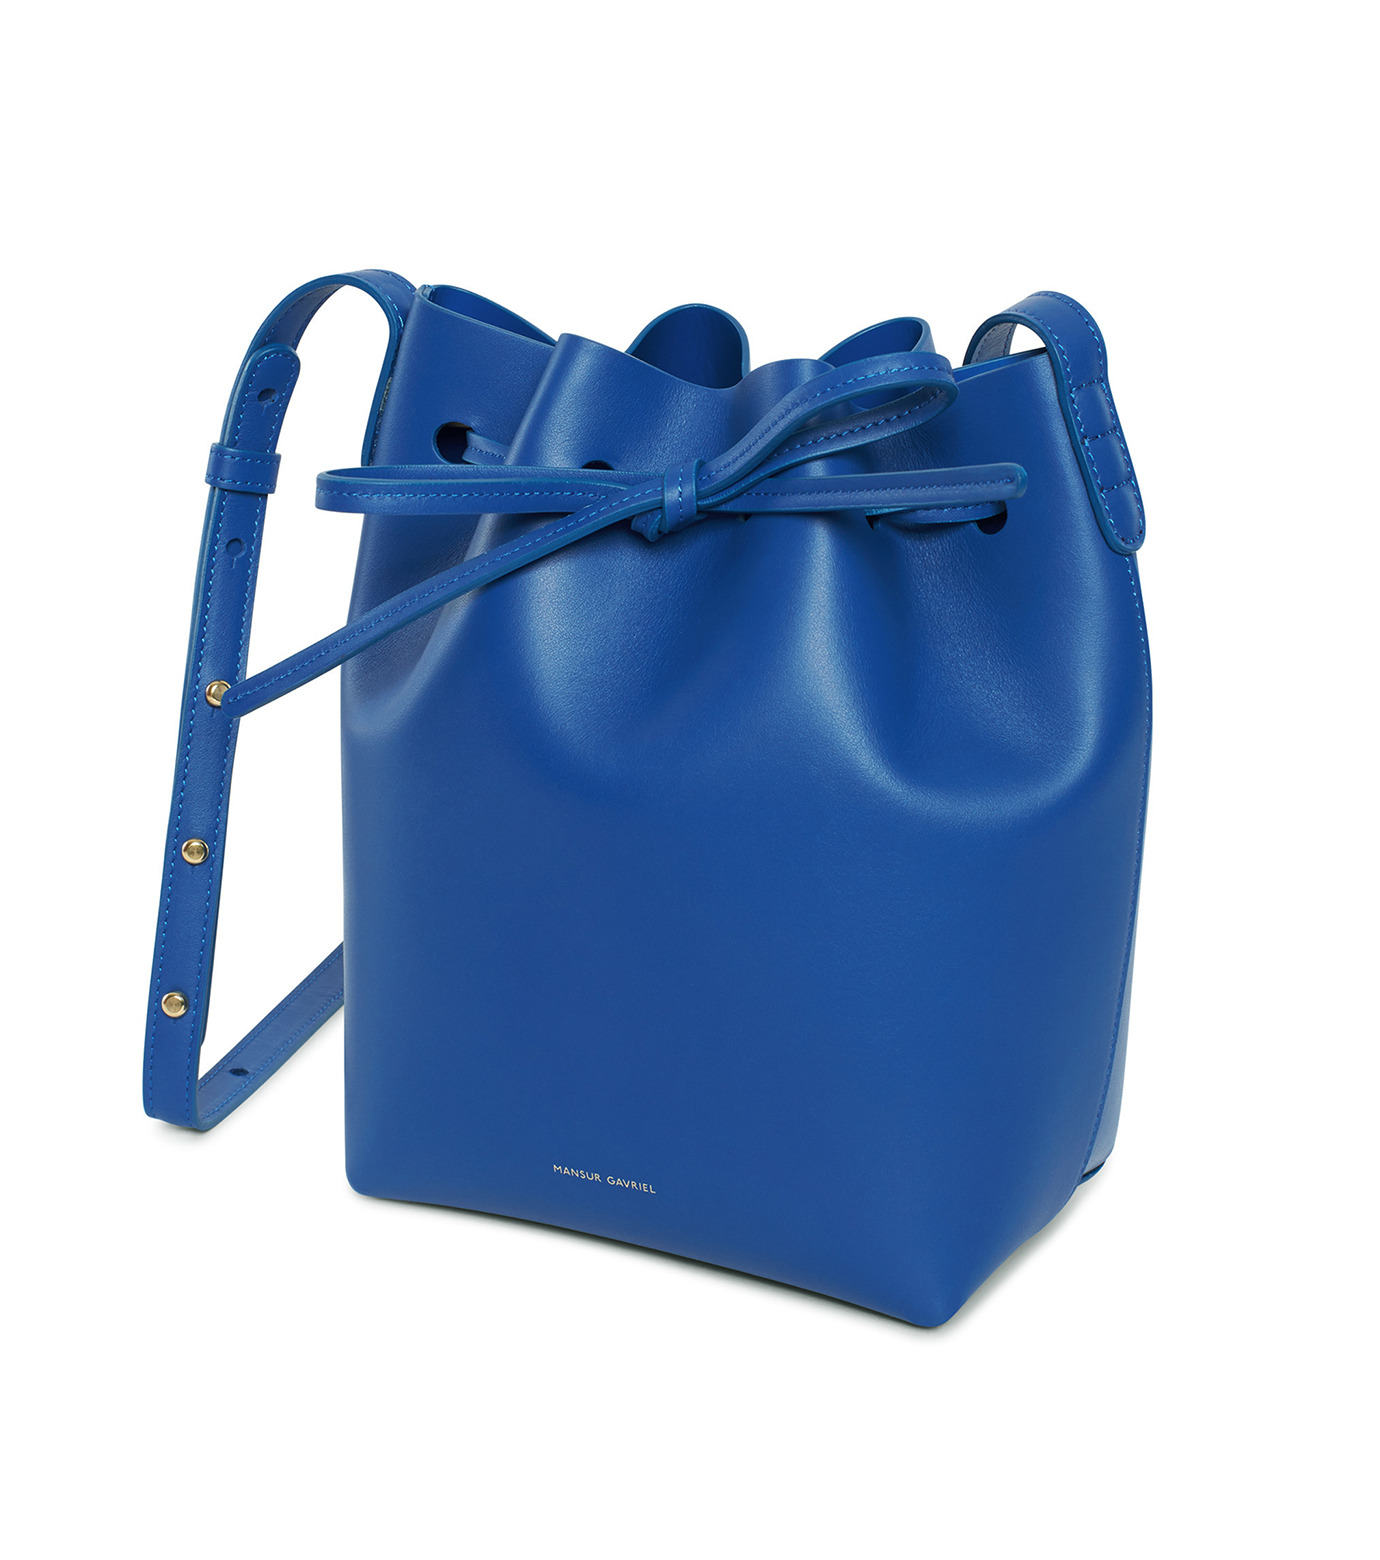 Mansur Gavriel(マンサーガブリエル)のMini Bucket Bag-BLUE(バッグ/bag)-HMB004CA-92 拡大詳細画像2